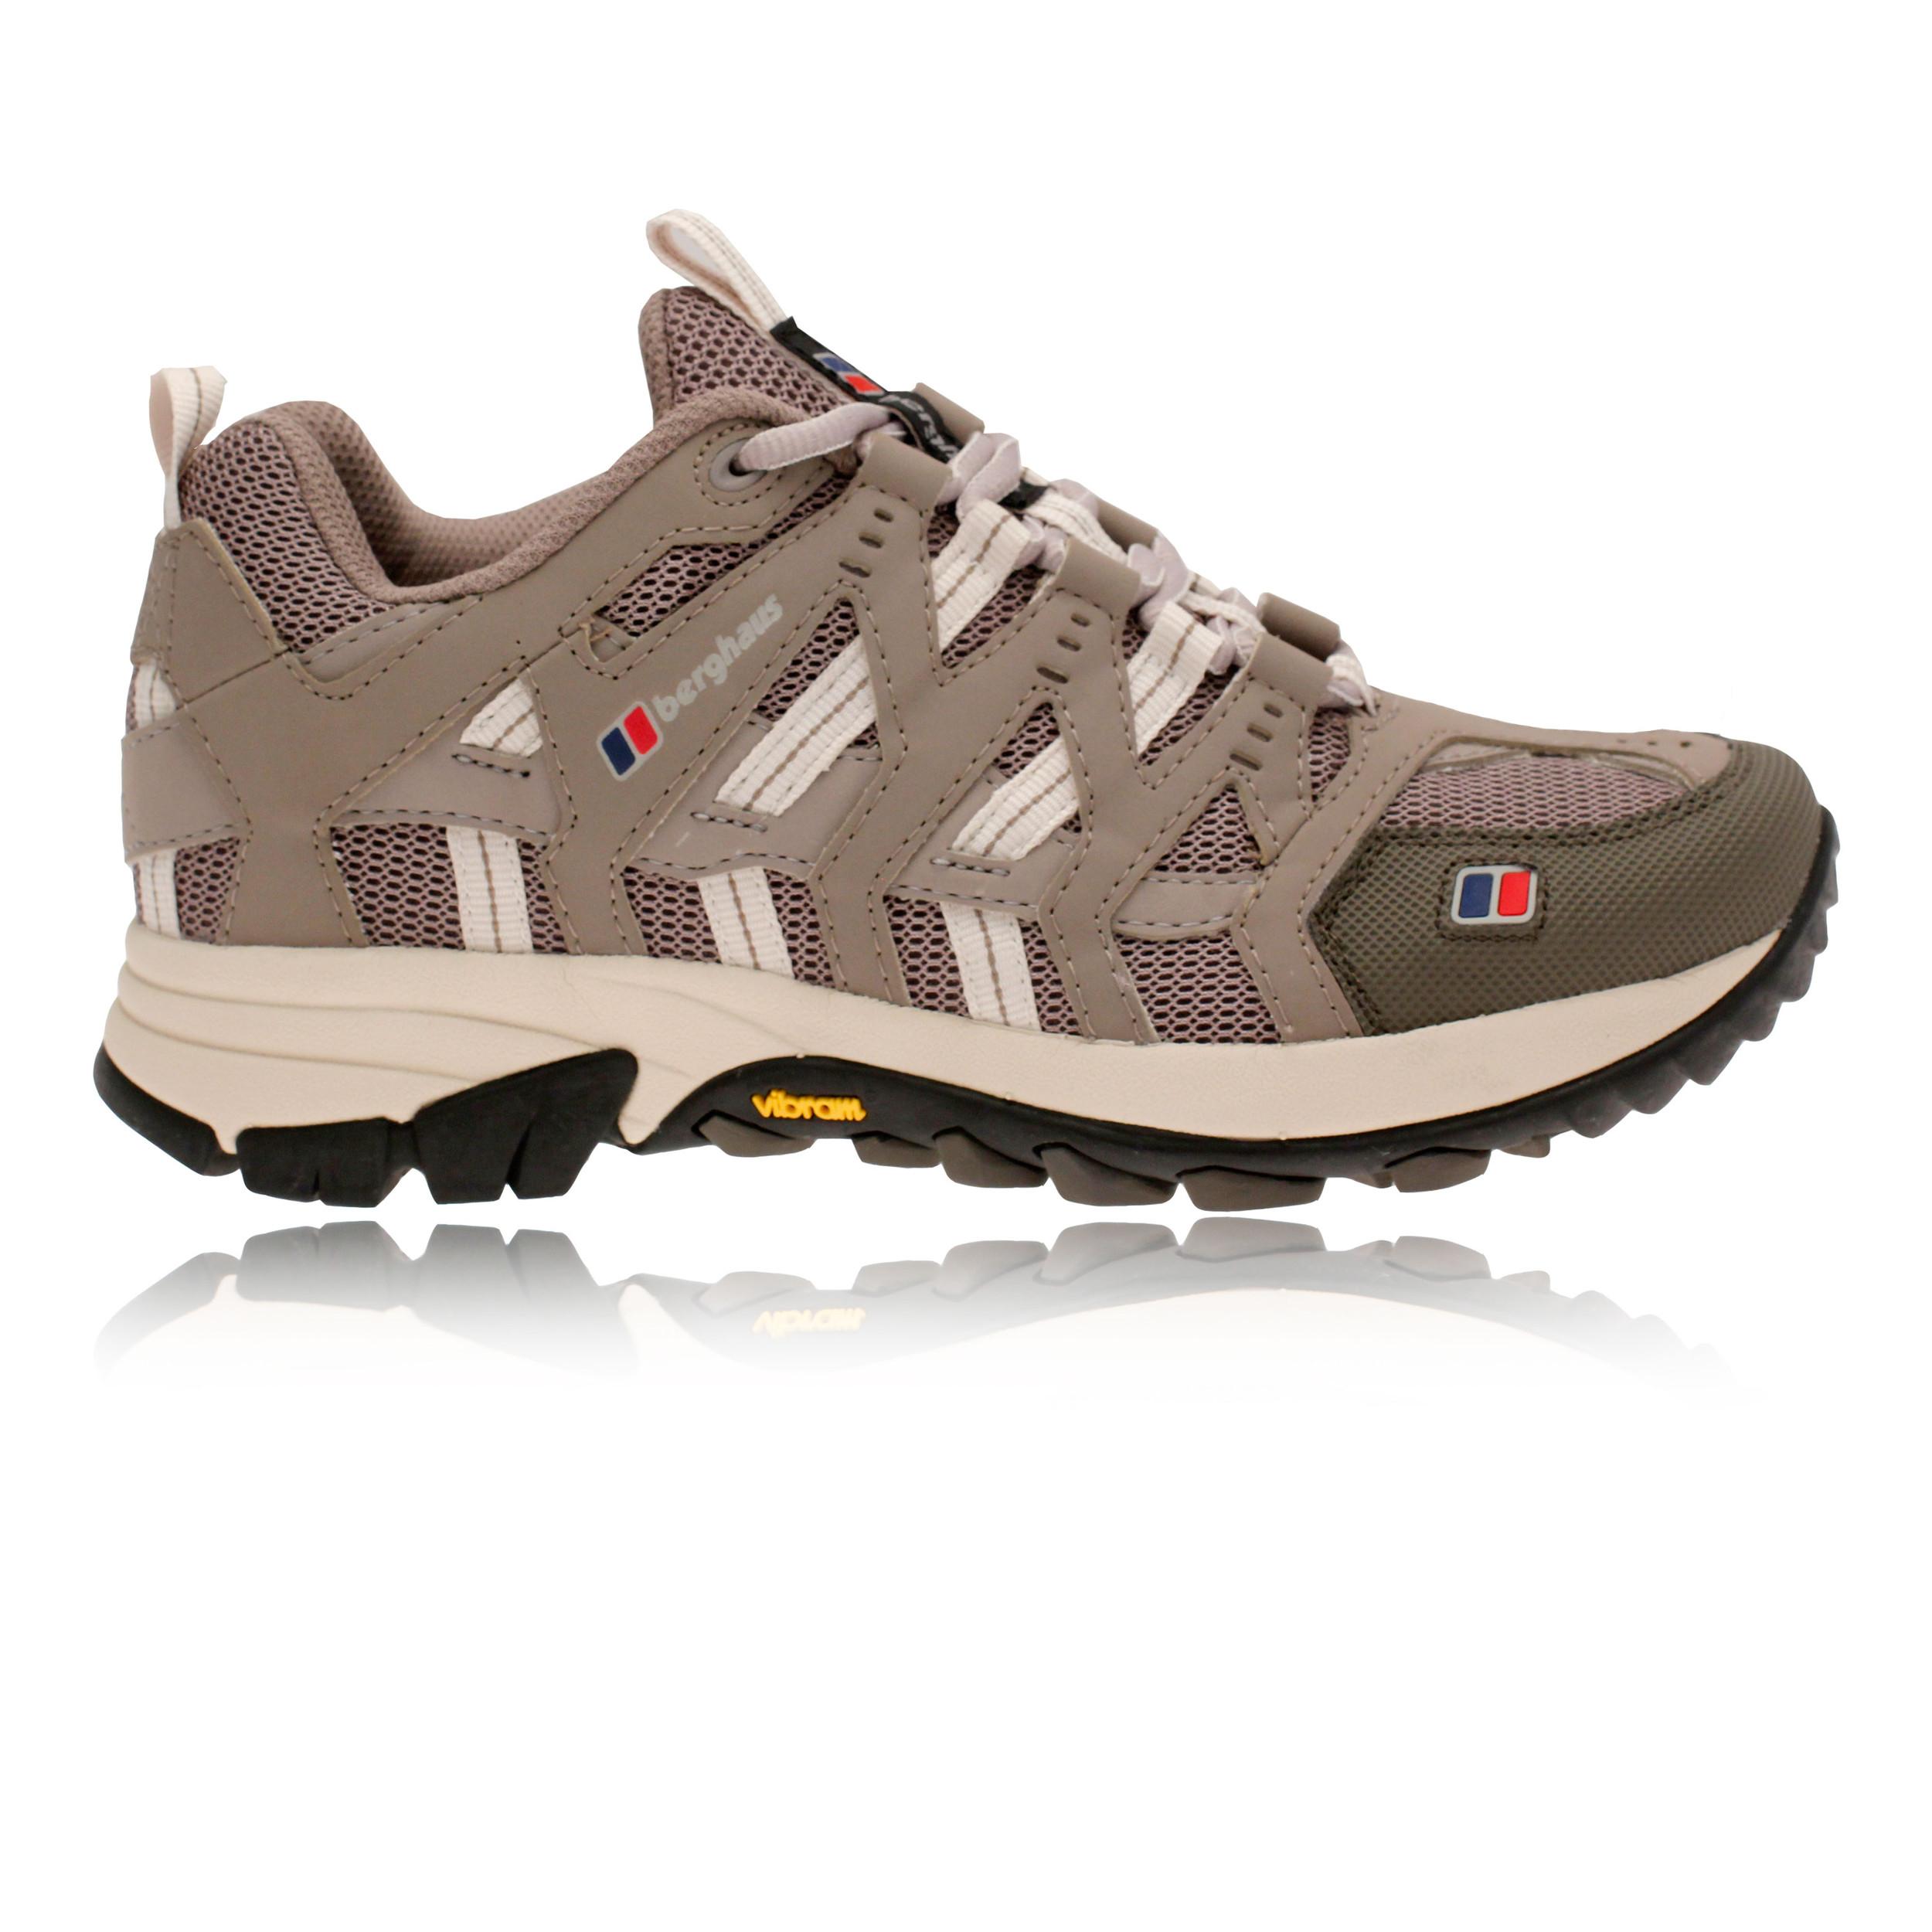 Berghaus Prognosis Womens Trail Shoes